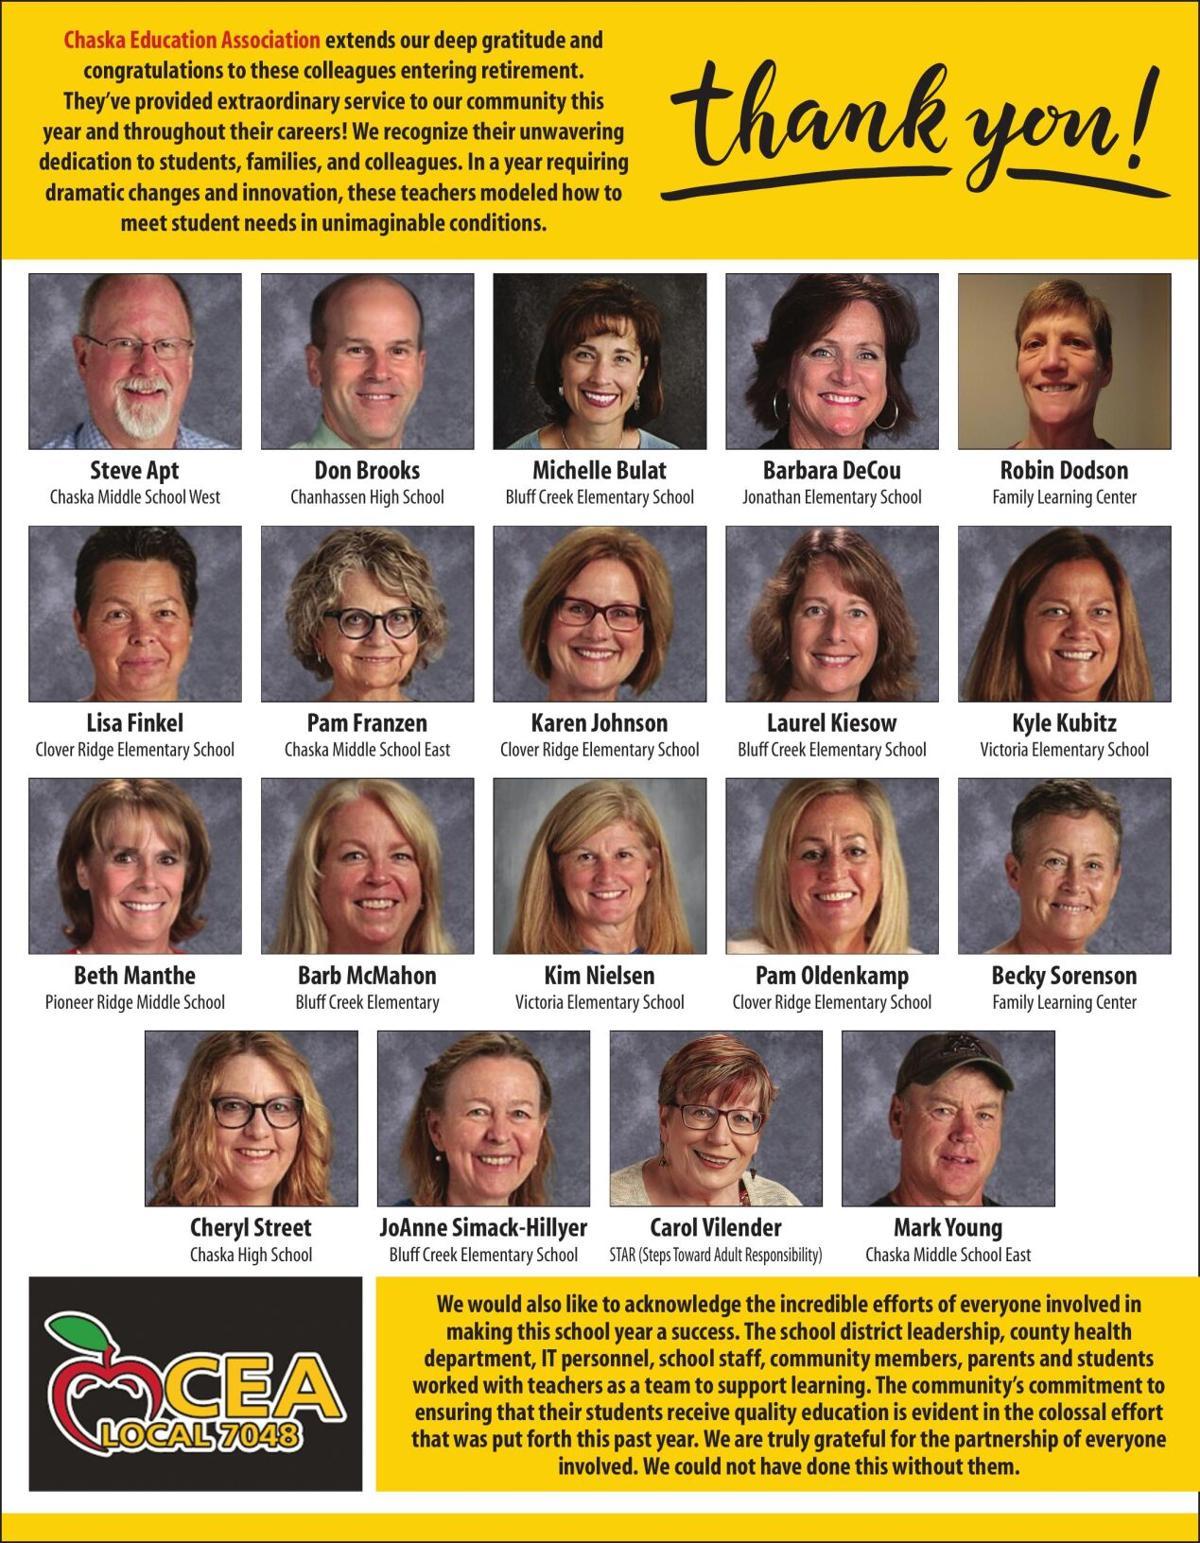 Chaska Education Association extends